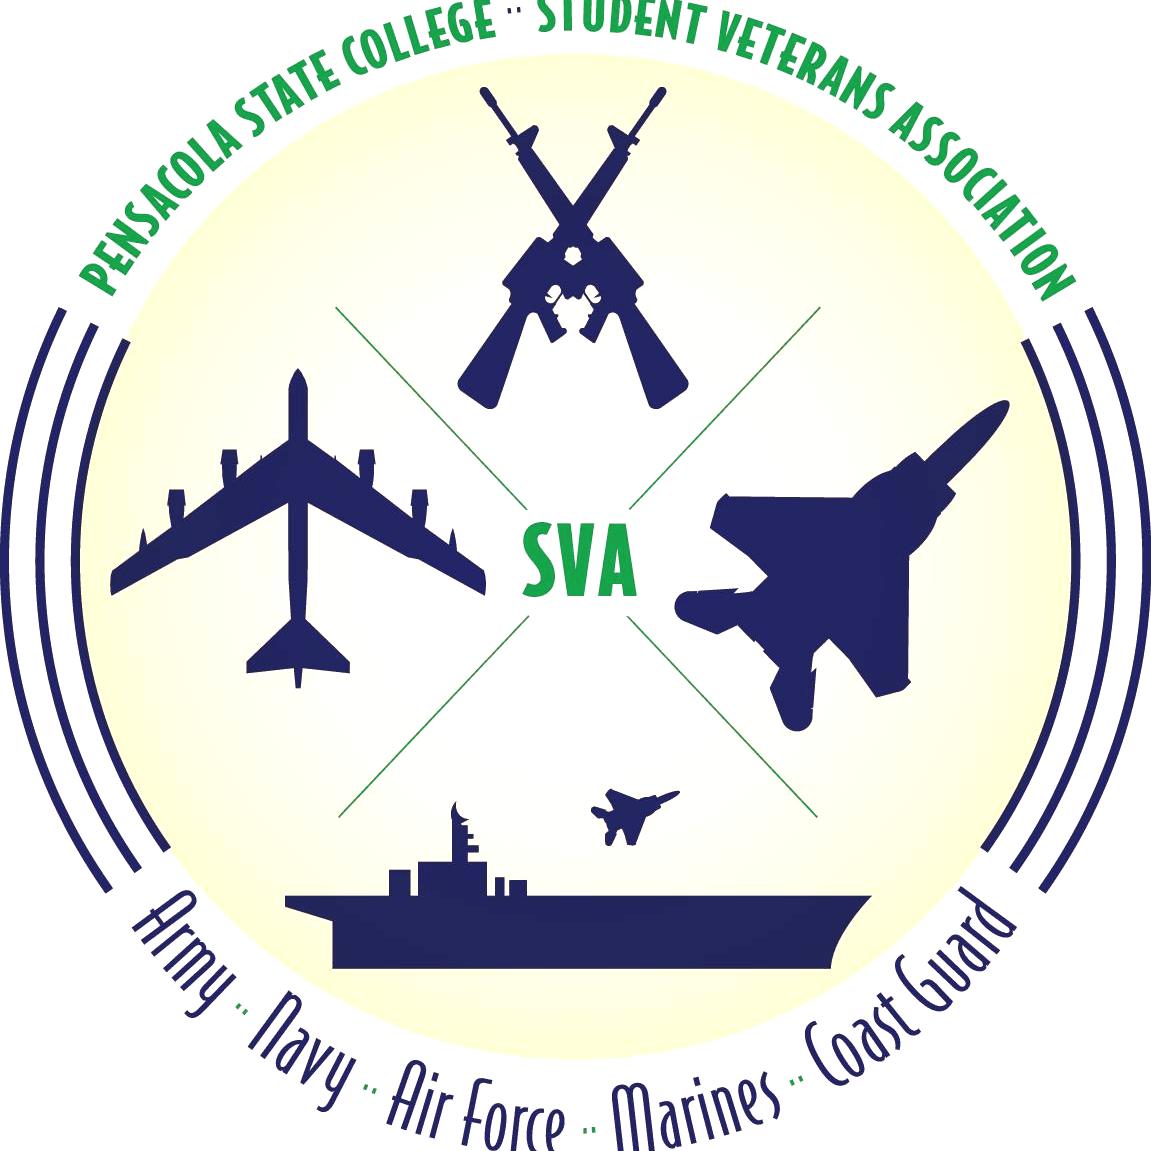 decorative image of student-veterans-logo , Student Veterans Association 2020-08-17 12:57:31